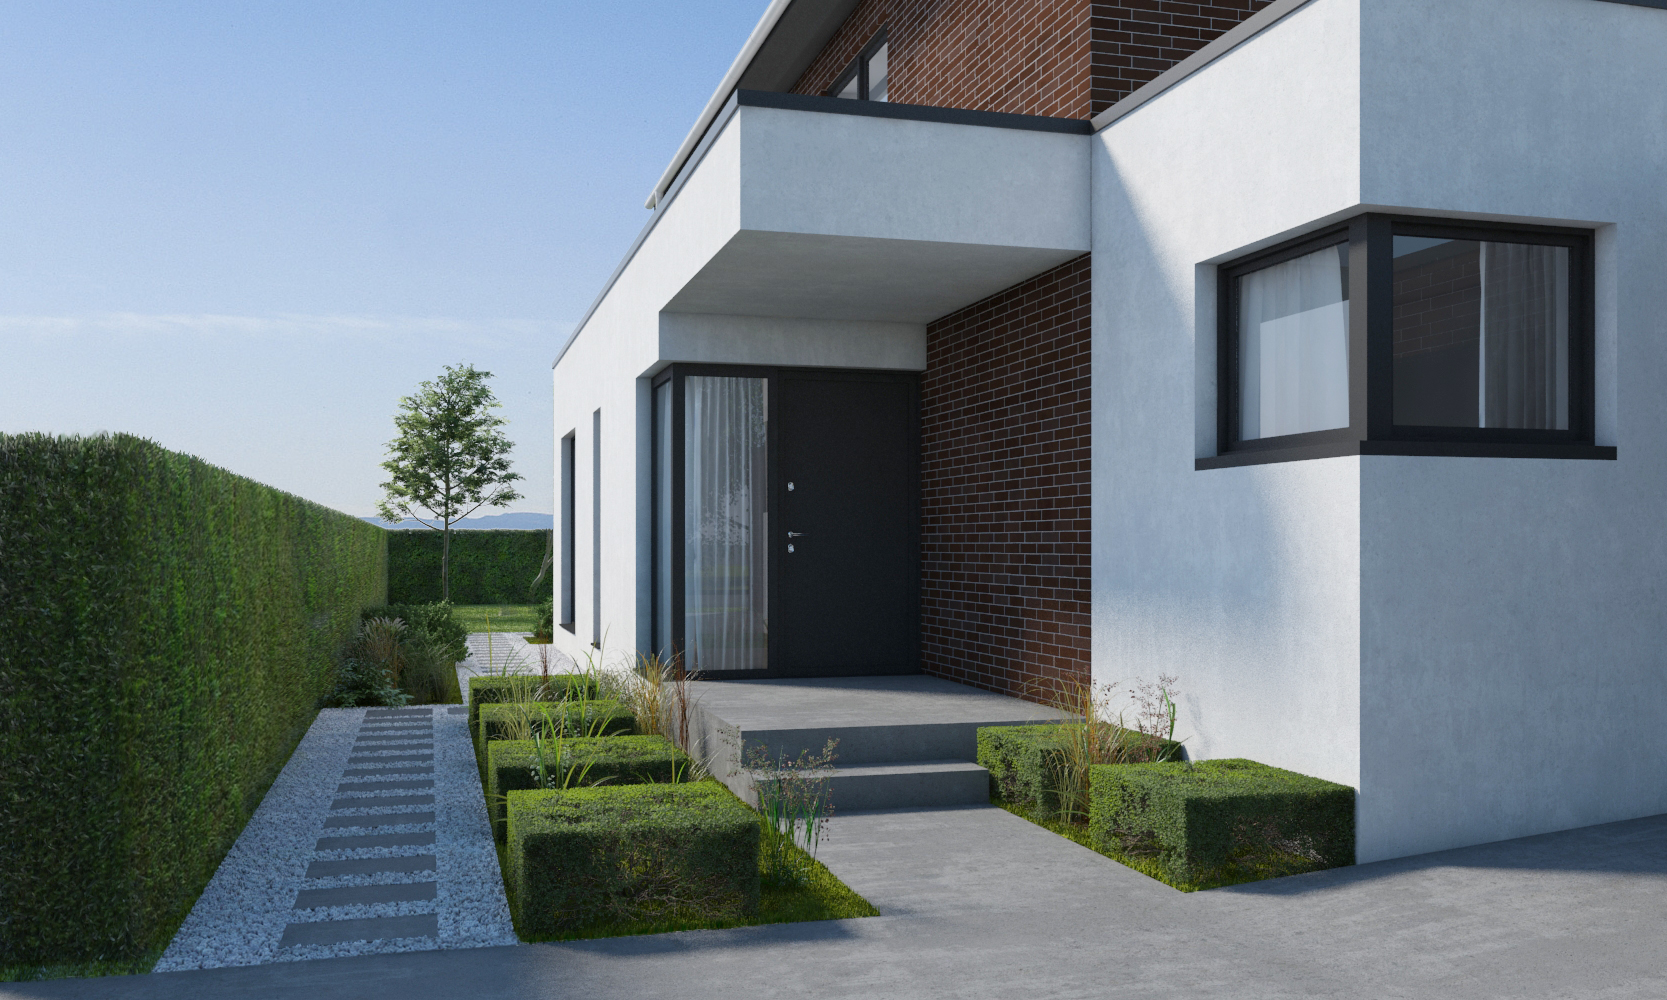 Modern Home with a Garden